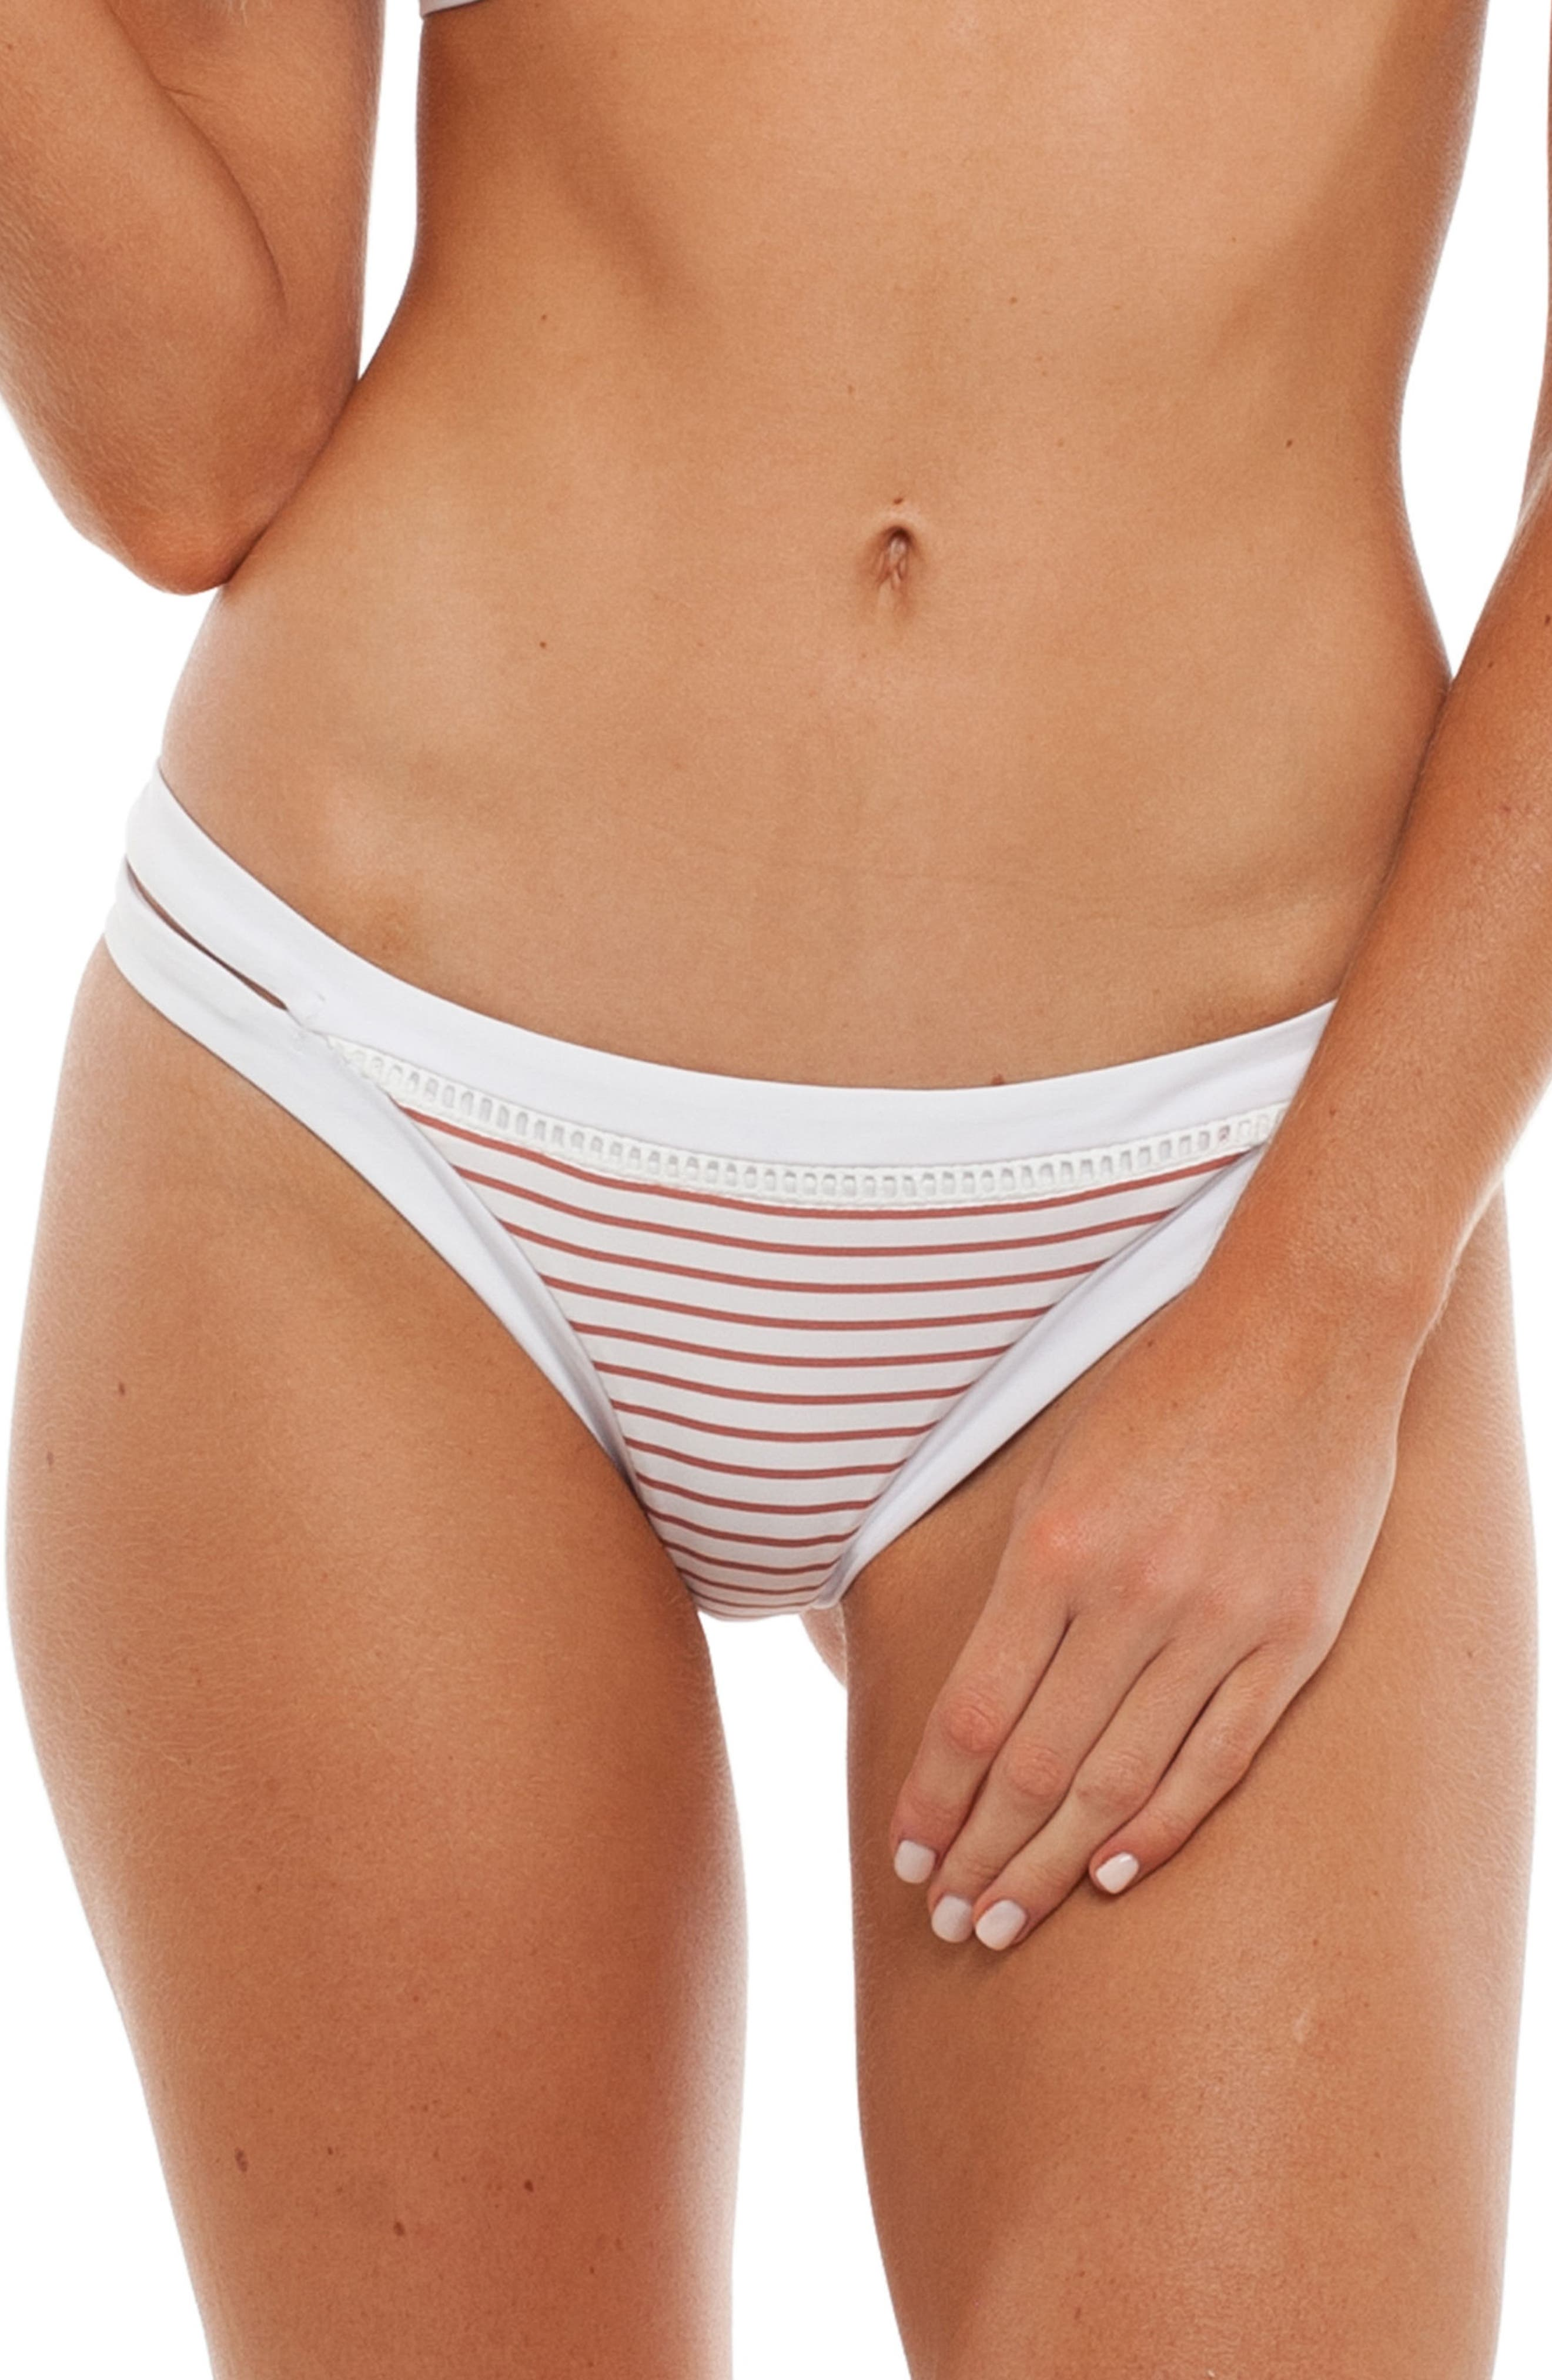 Sunkissed Itsy Bikini Bottoms,                             Main thumbnail 1, color,                             DAWN